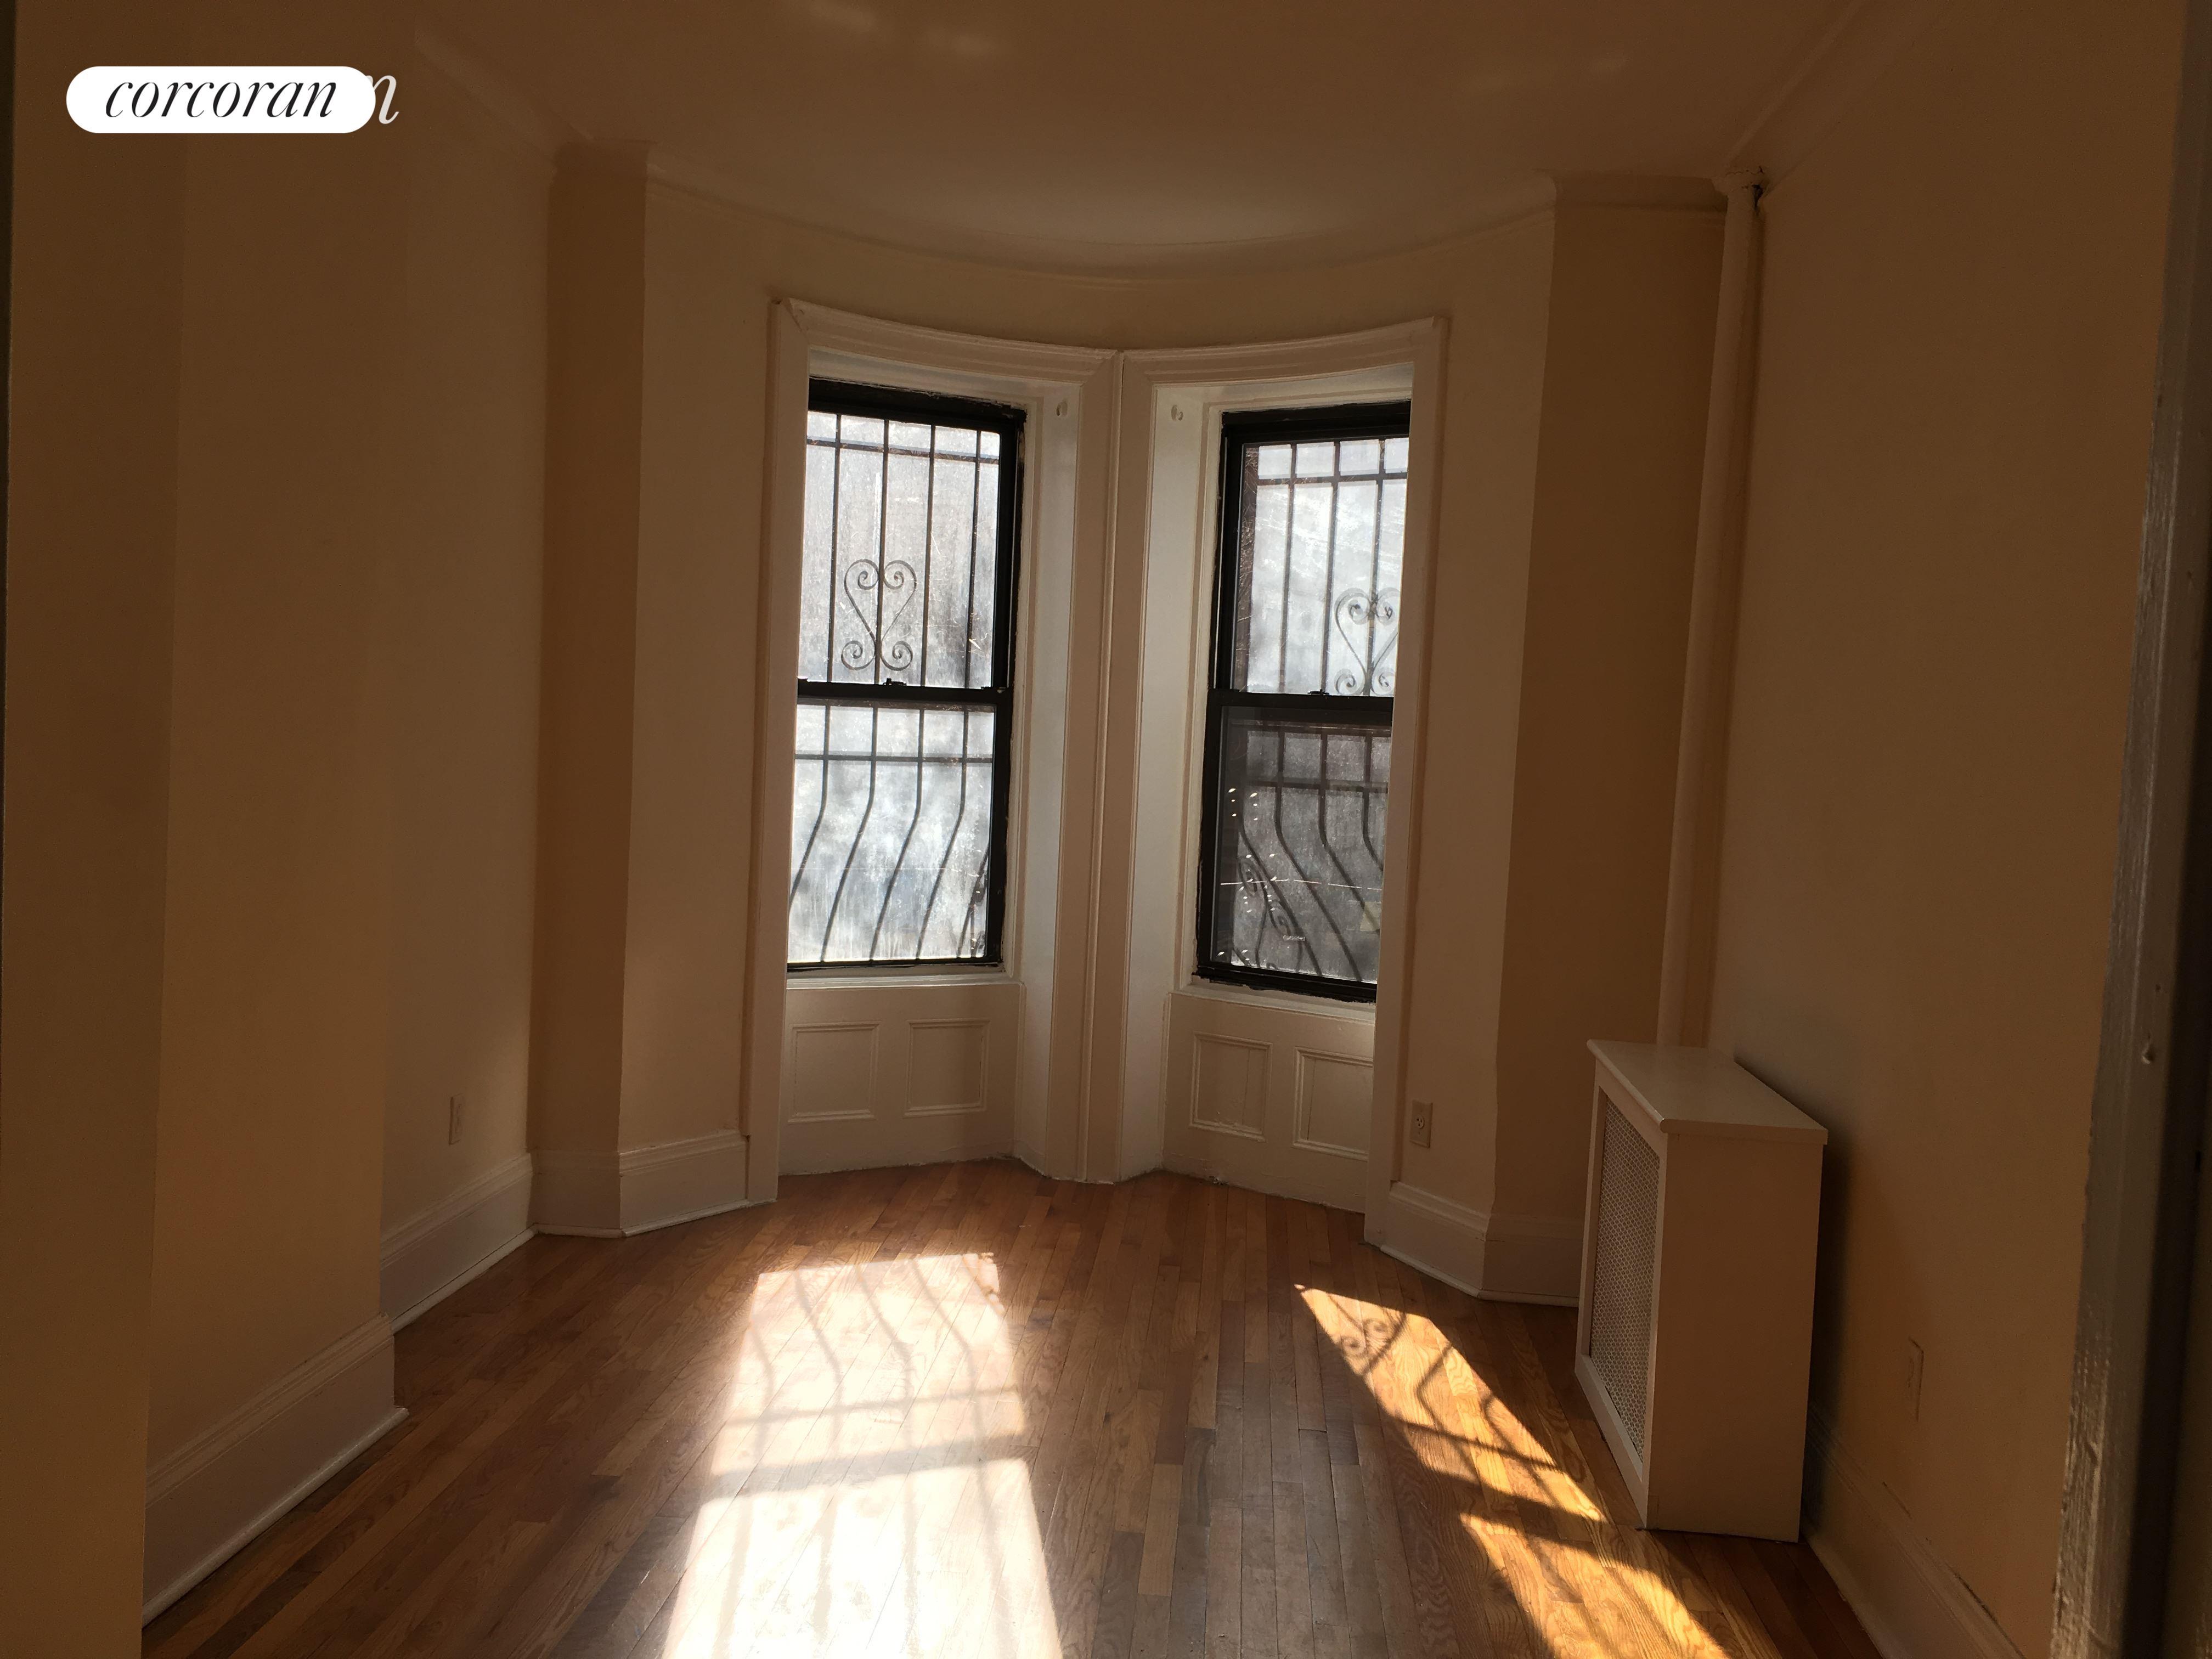 Corcoran 703 Carroll Street Apt 1l Park Slope Rentals